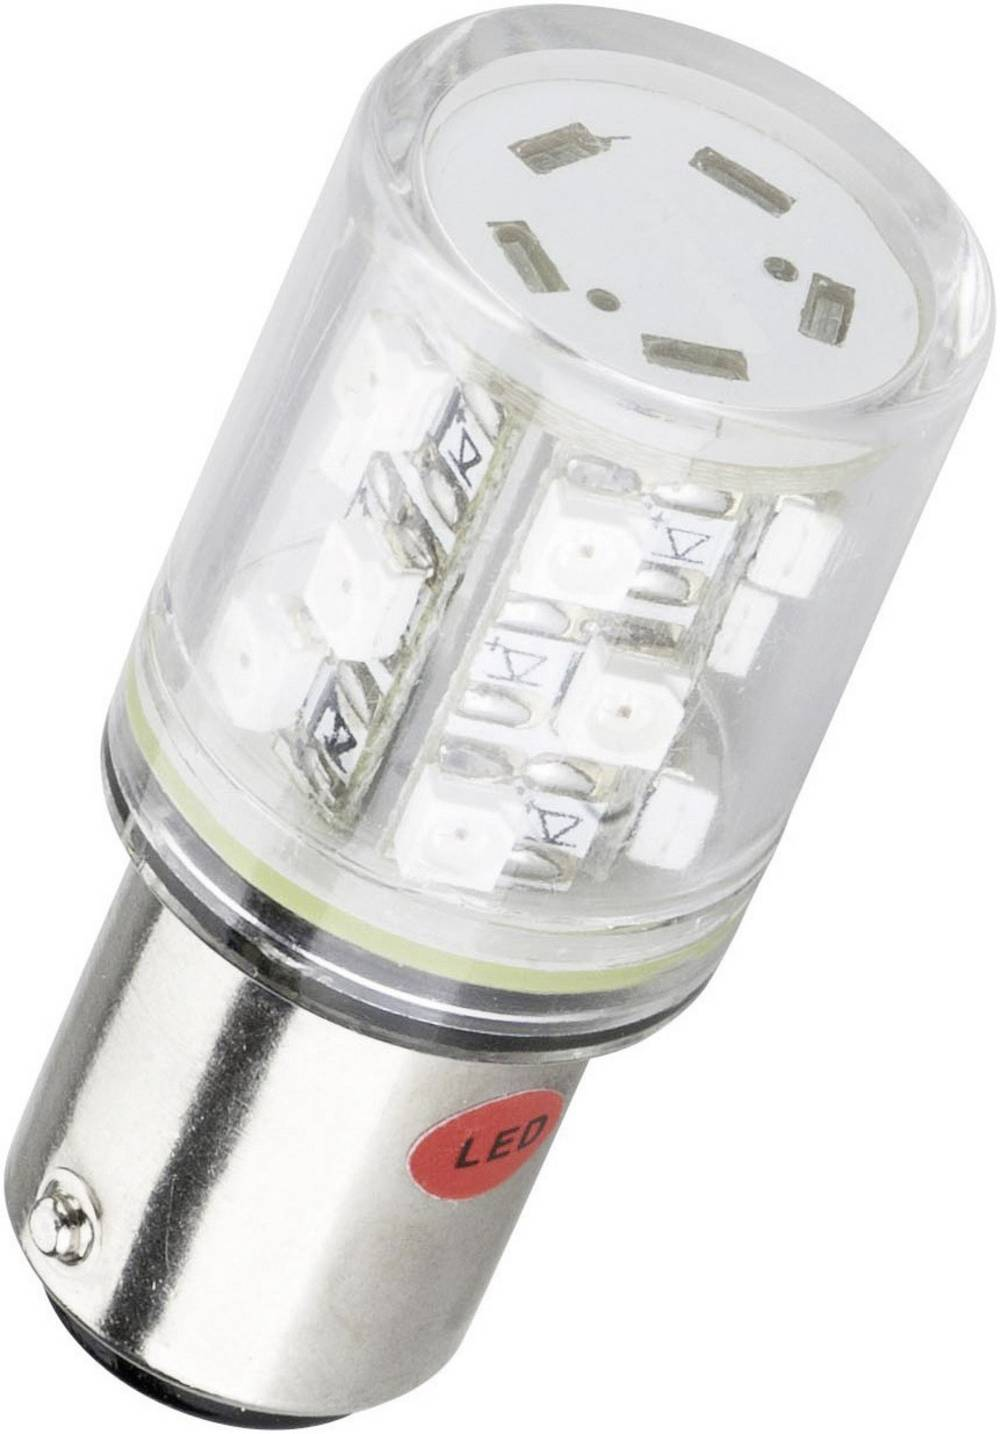 LED žarnica BA15d rdeča 230 V/AC 5 lm Barthelme 52162411